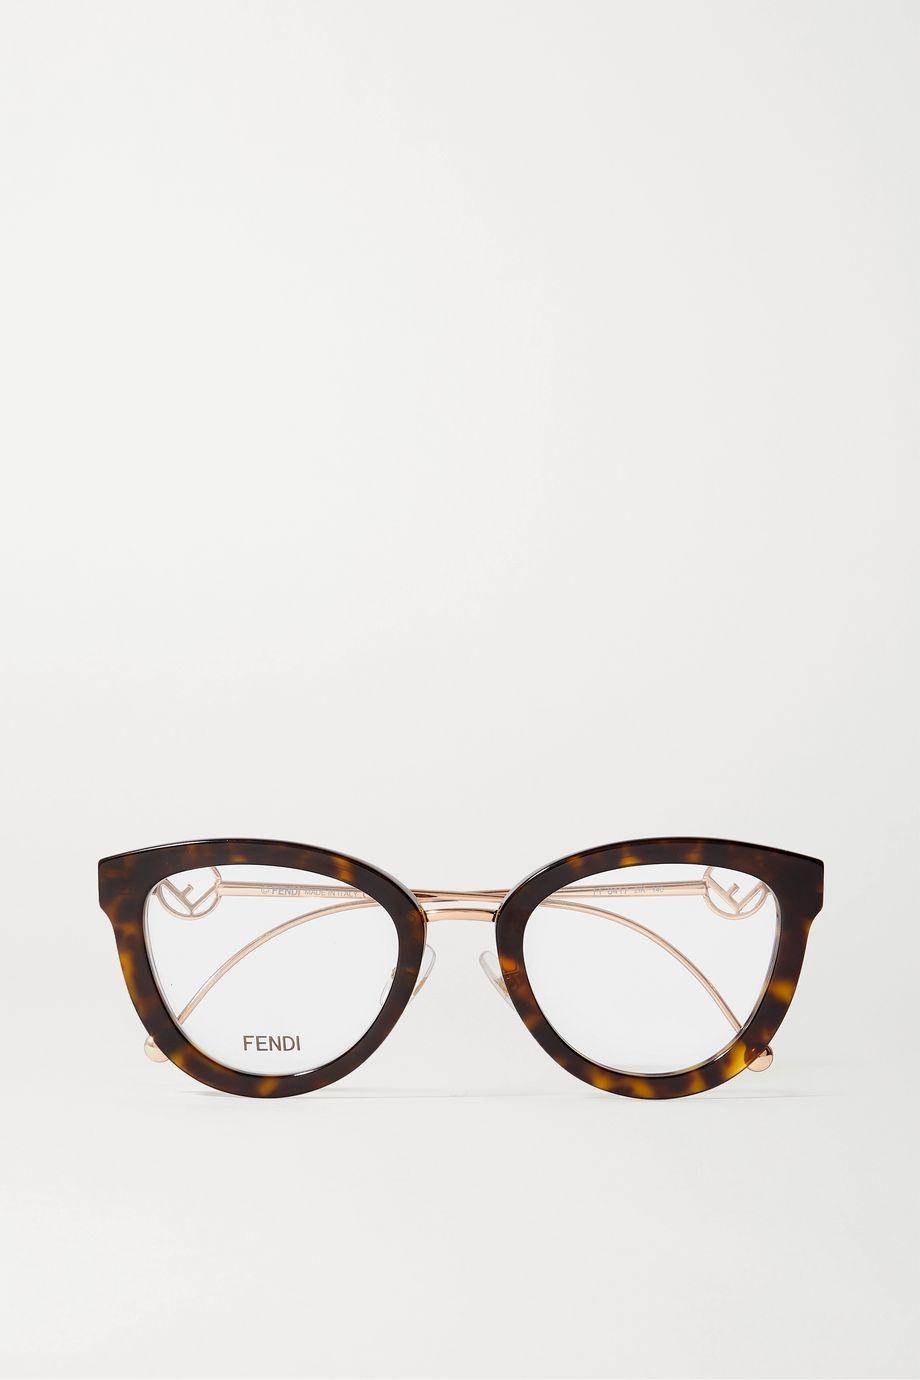 Fendi Square-frame tortoiseshell acetate and gold-tone optical glasses